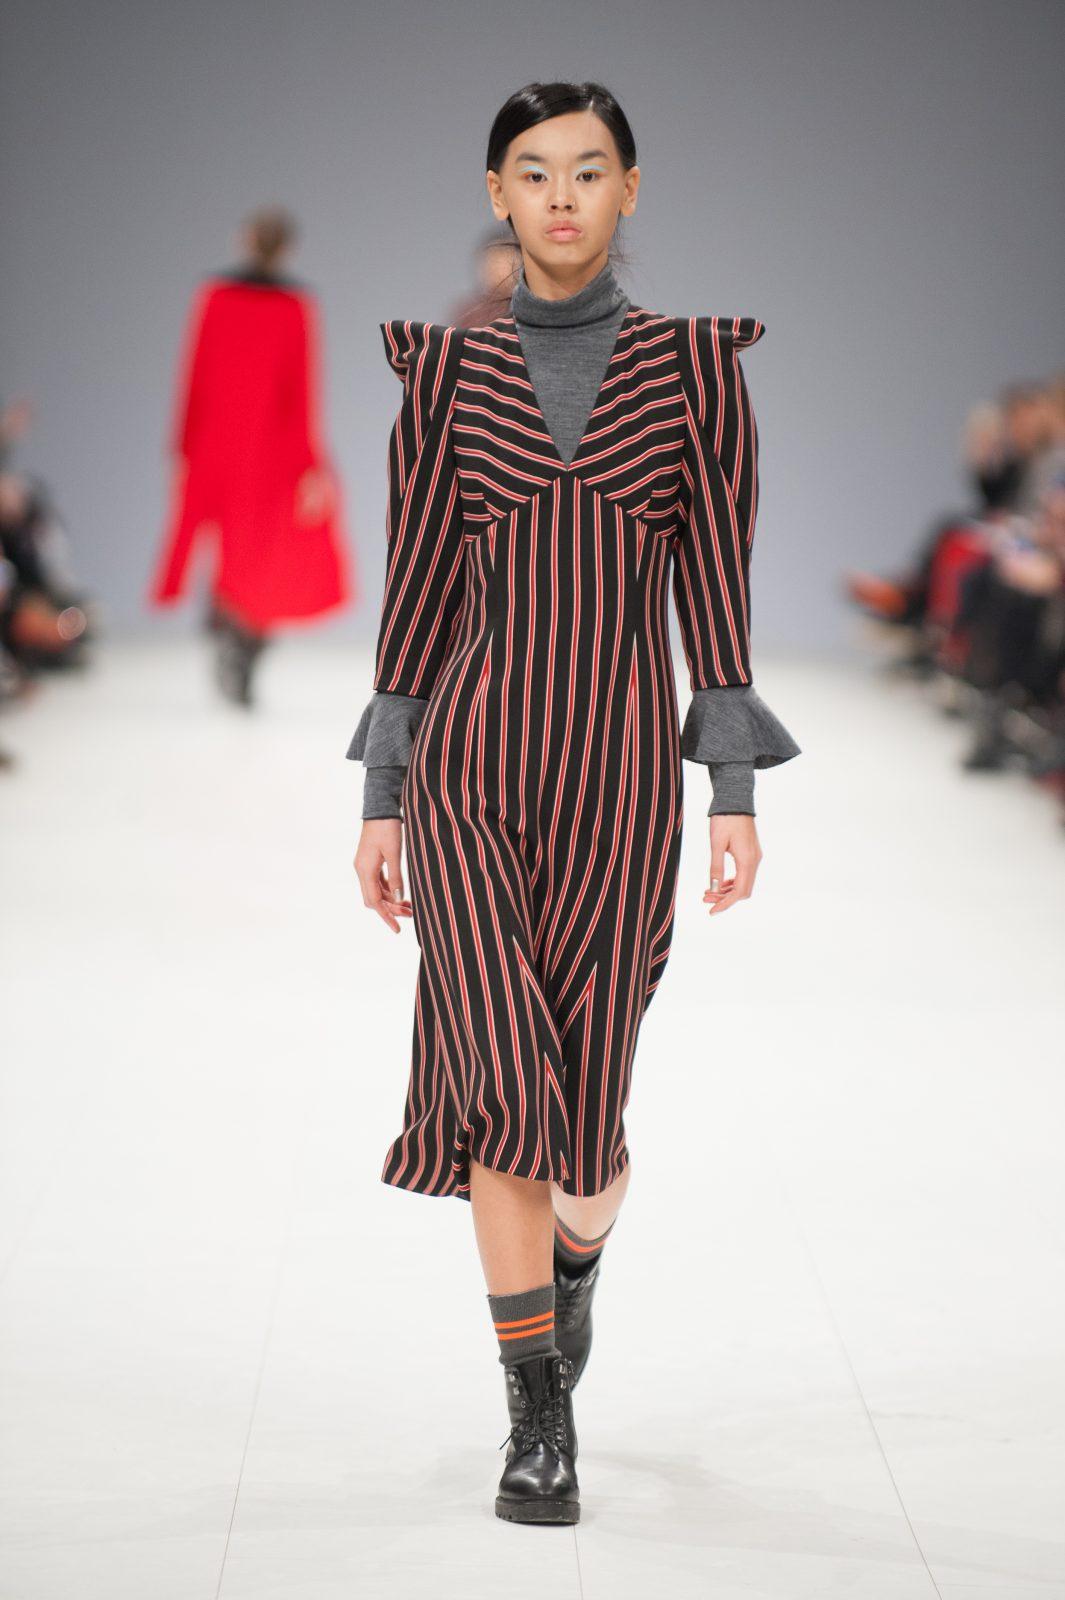 5 Ukrainian Designers to know FAB L'Style Poustovit